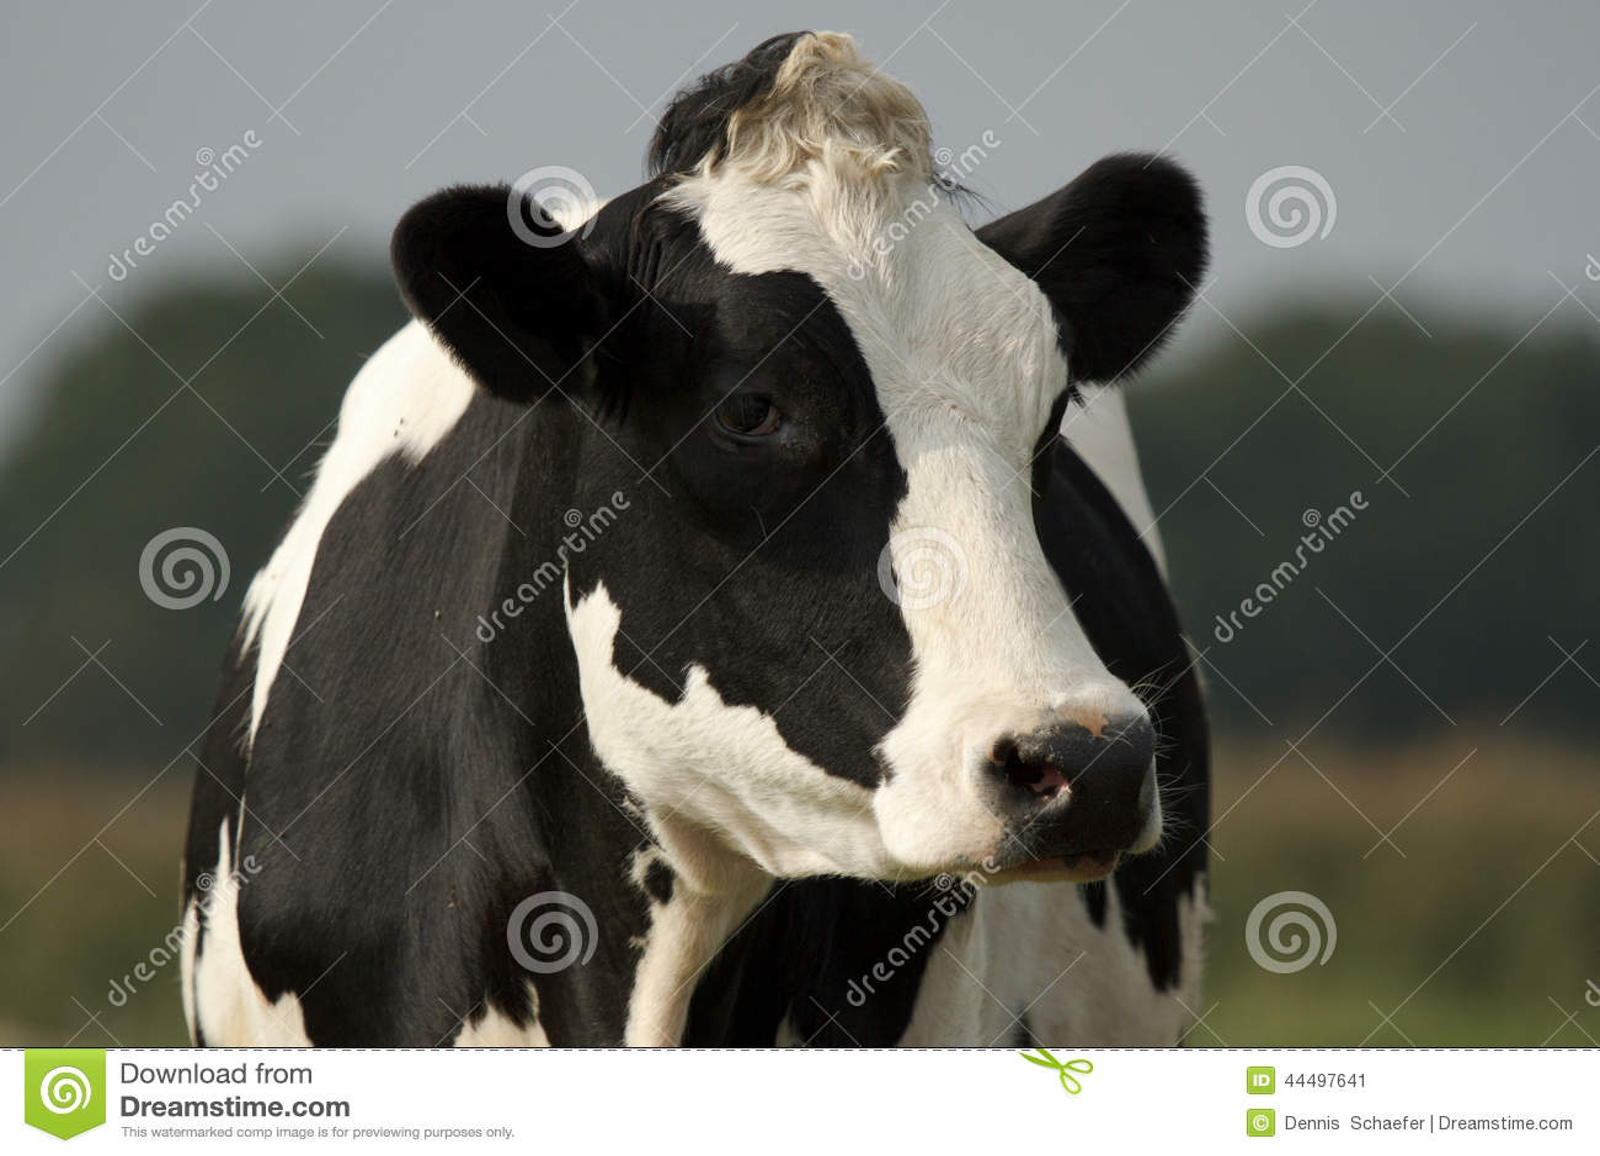 black and white cow closeup stock photo